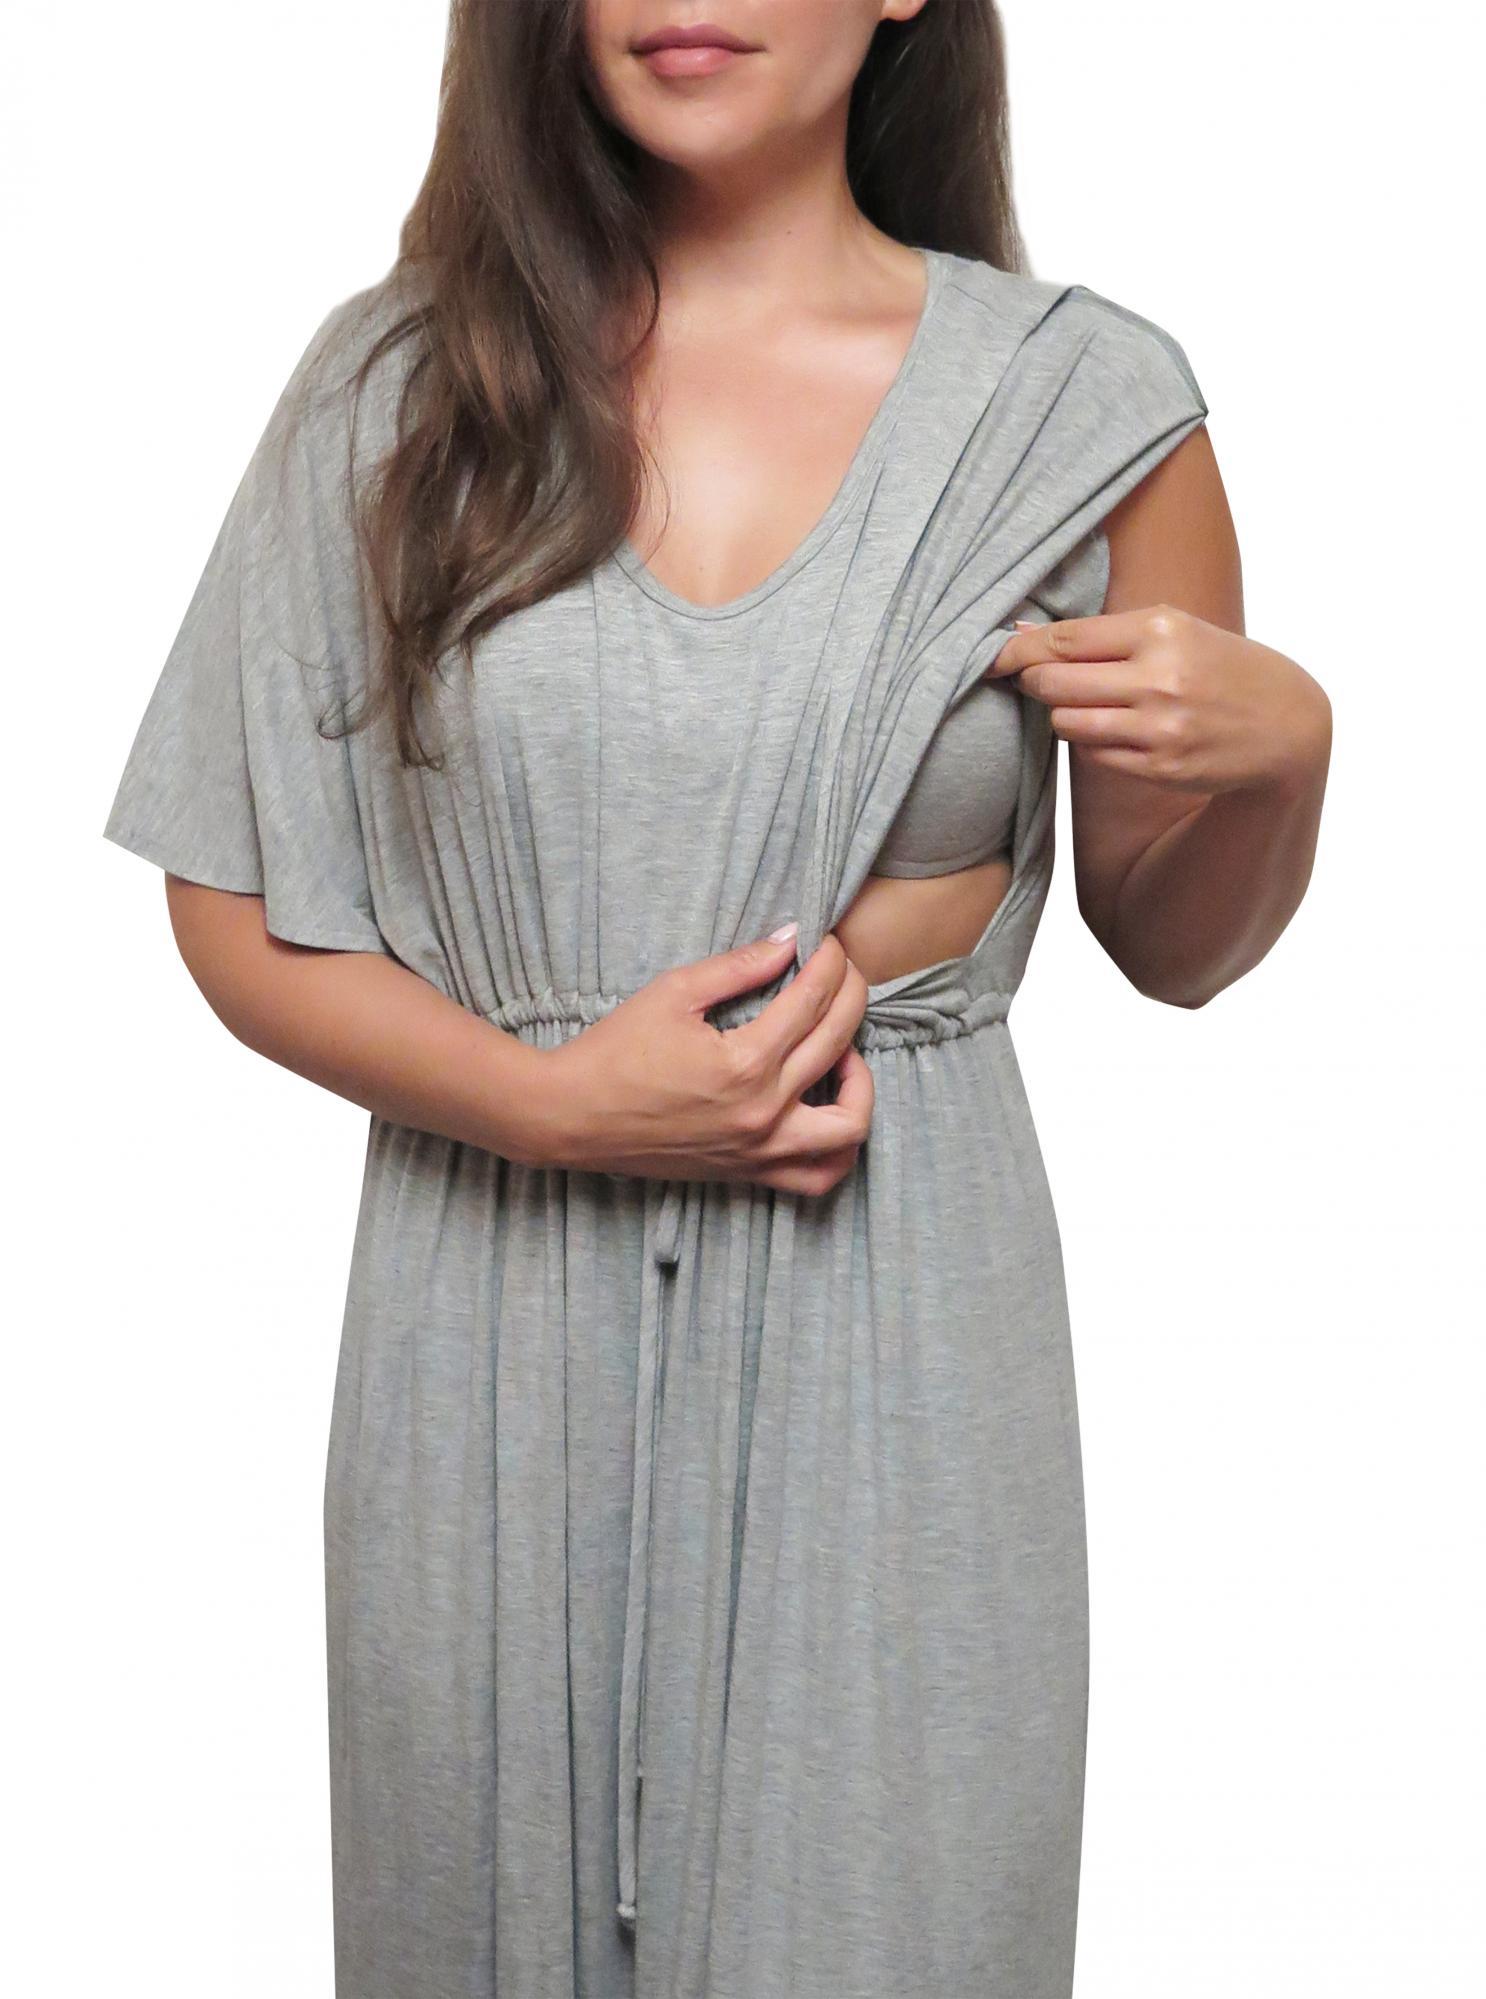 bun-to-baby-kaftan-maxi-nursing-dress-opening.jpg